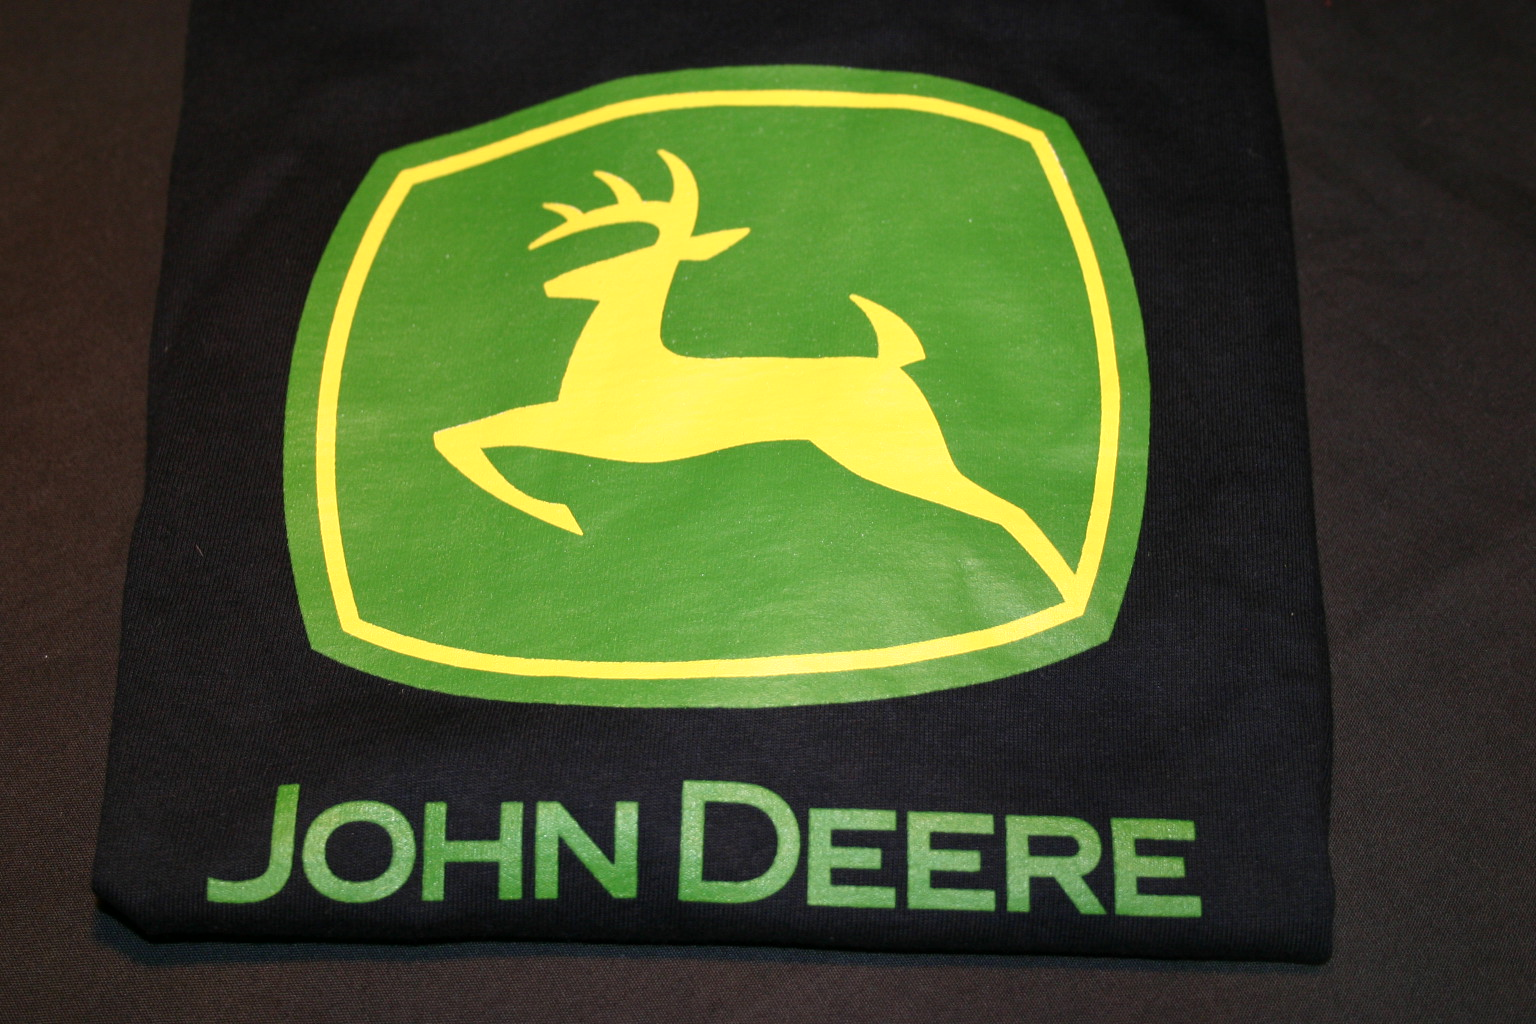 John Deere Logo Wallpaper 2015 1536x1024